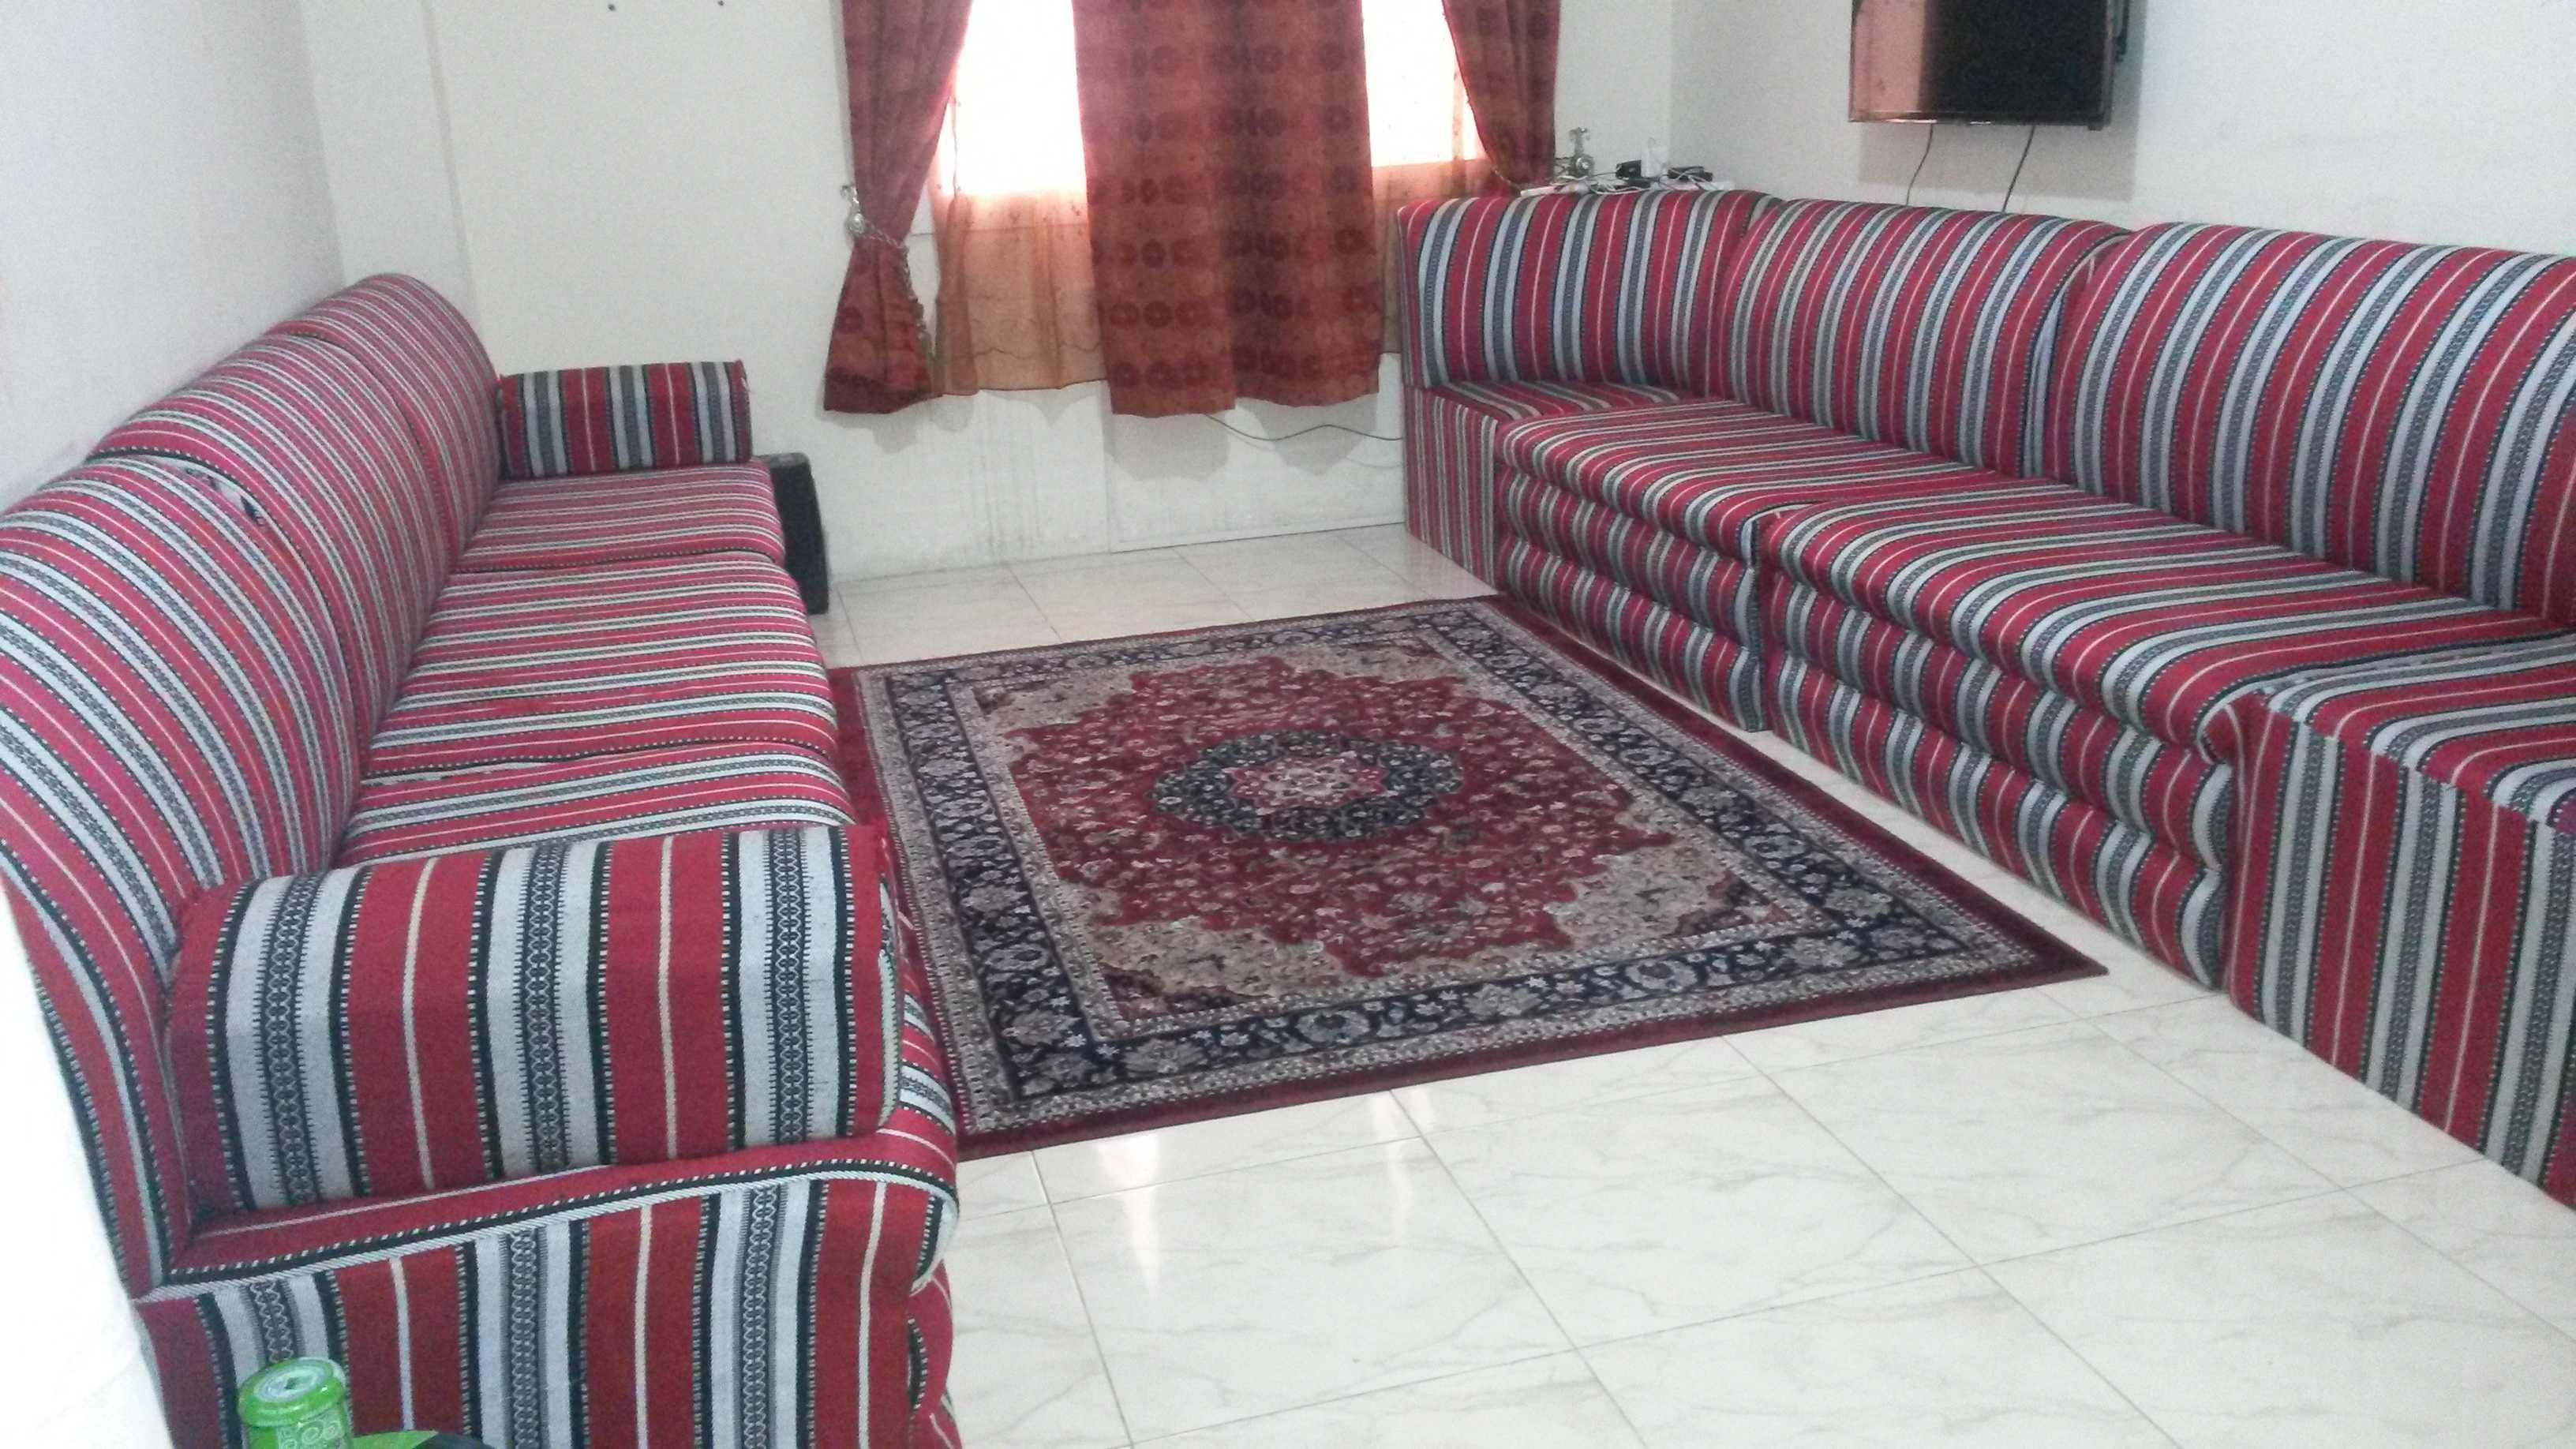 Arabic Majlis for Sale Qatar Living : 20150209162830 from qatarliving.com size 3264 x 1836 jpeg 500kB